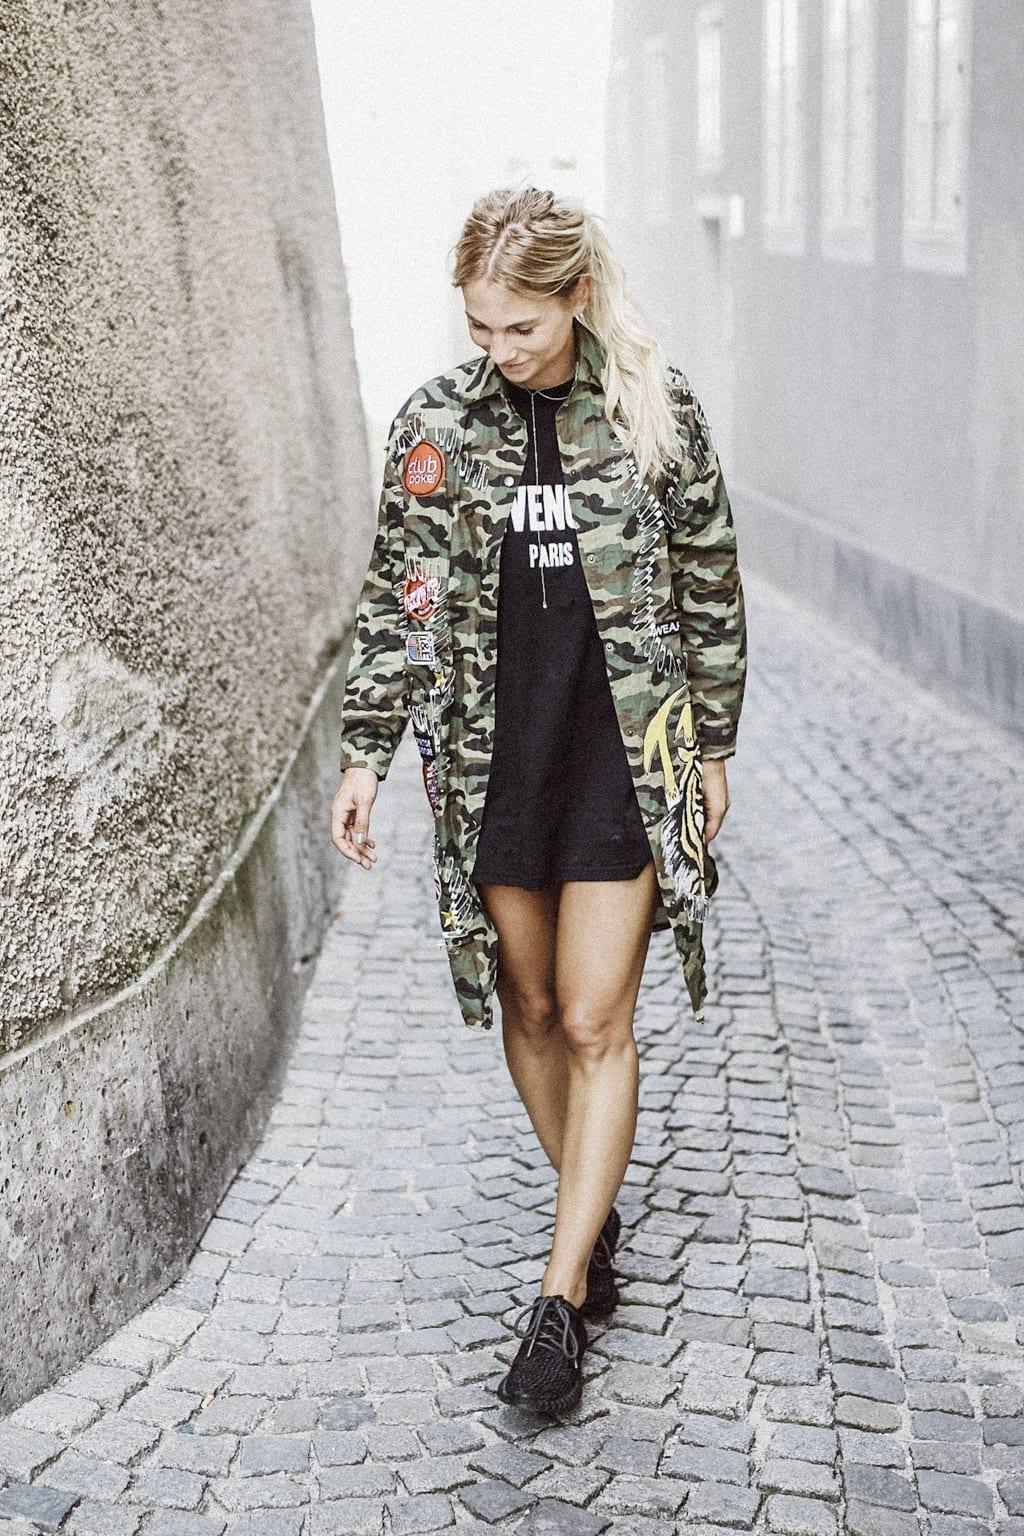 CK-1606_salzburg-fashion-street-style-look-magazine-karin-kaswurm-electric-love-2016-festival-camouflage-military-jacket-8941